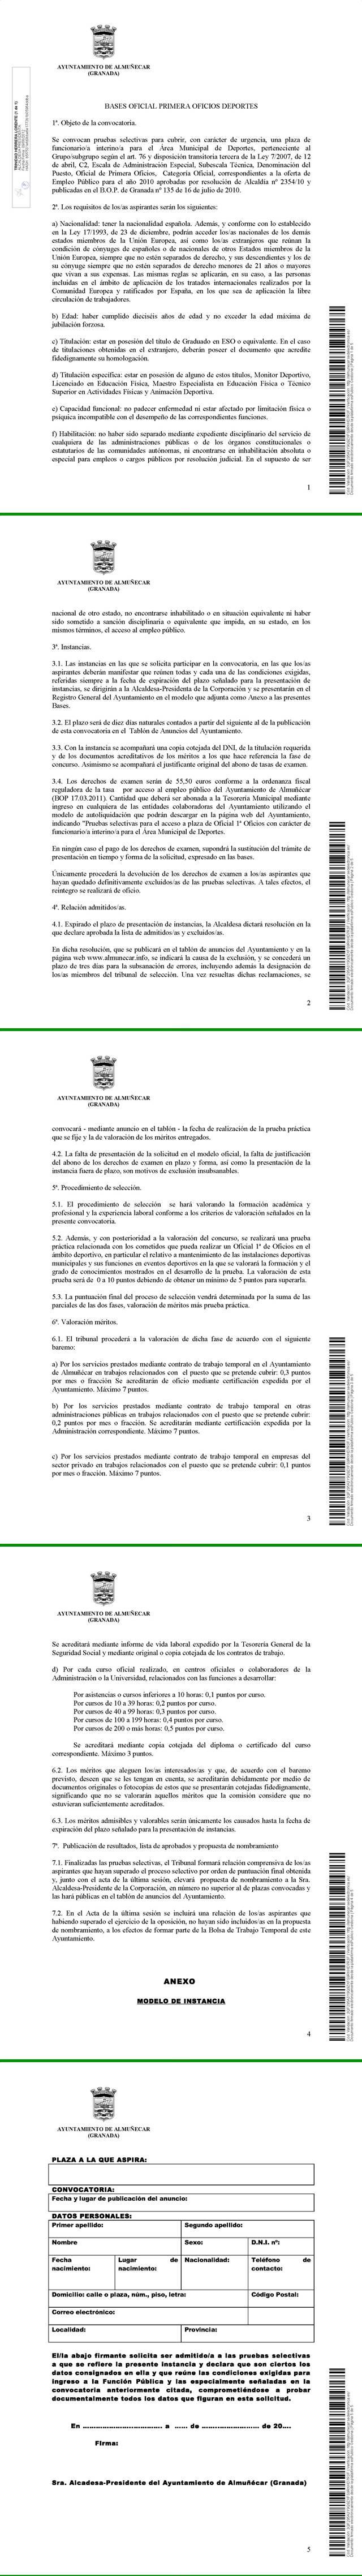 20120822131417-bases-oficial-de-primera-deportes-pagina-1-vert.jpg